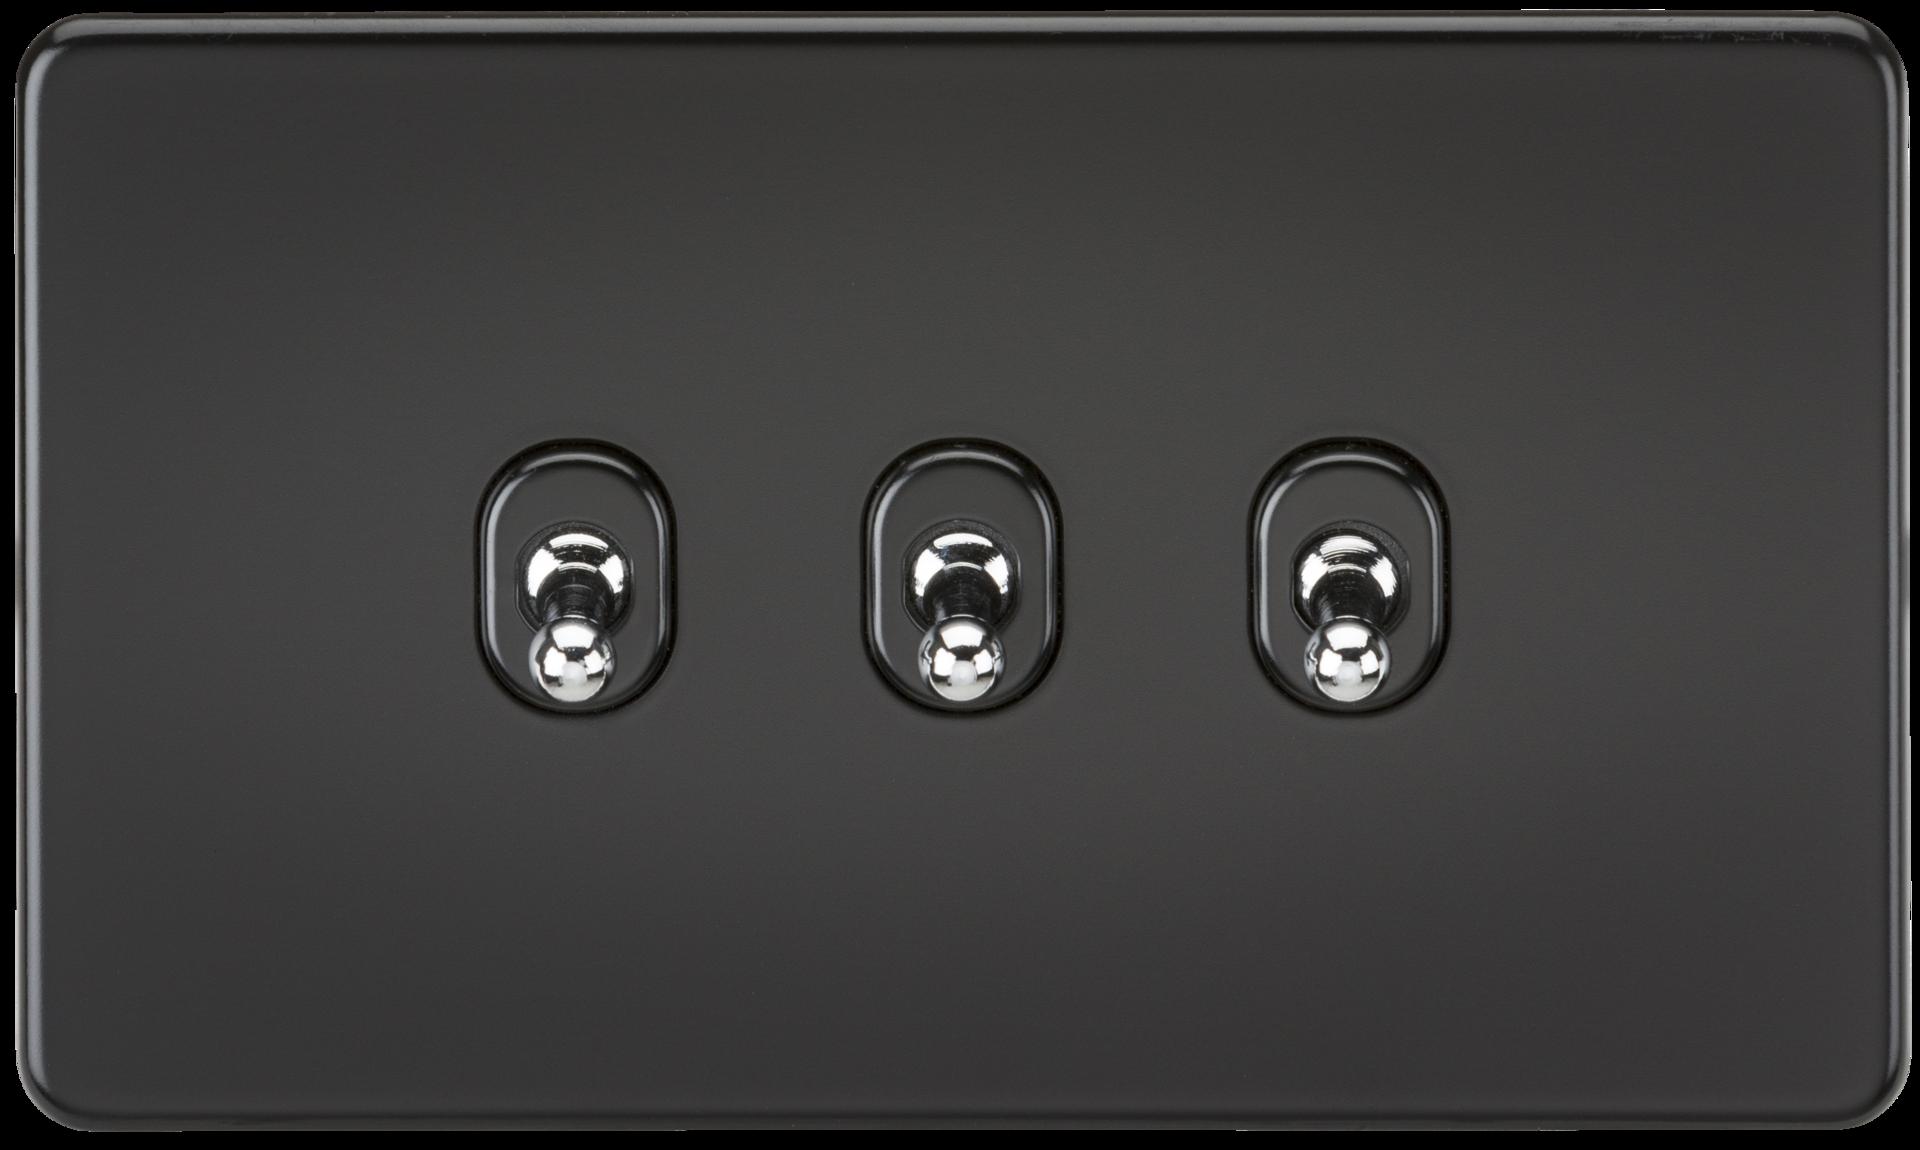 SCREWLESS 10A 3G 2 WAY TOGGLE SWITCH - MATT BLACK